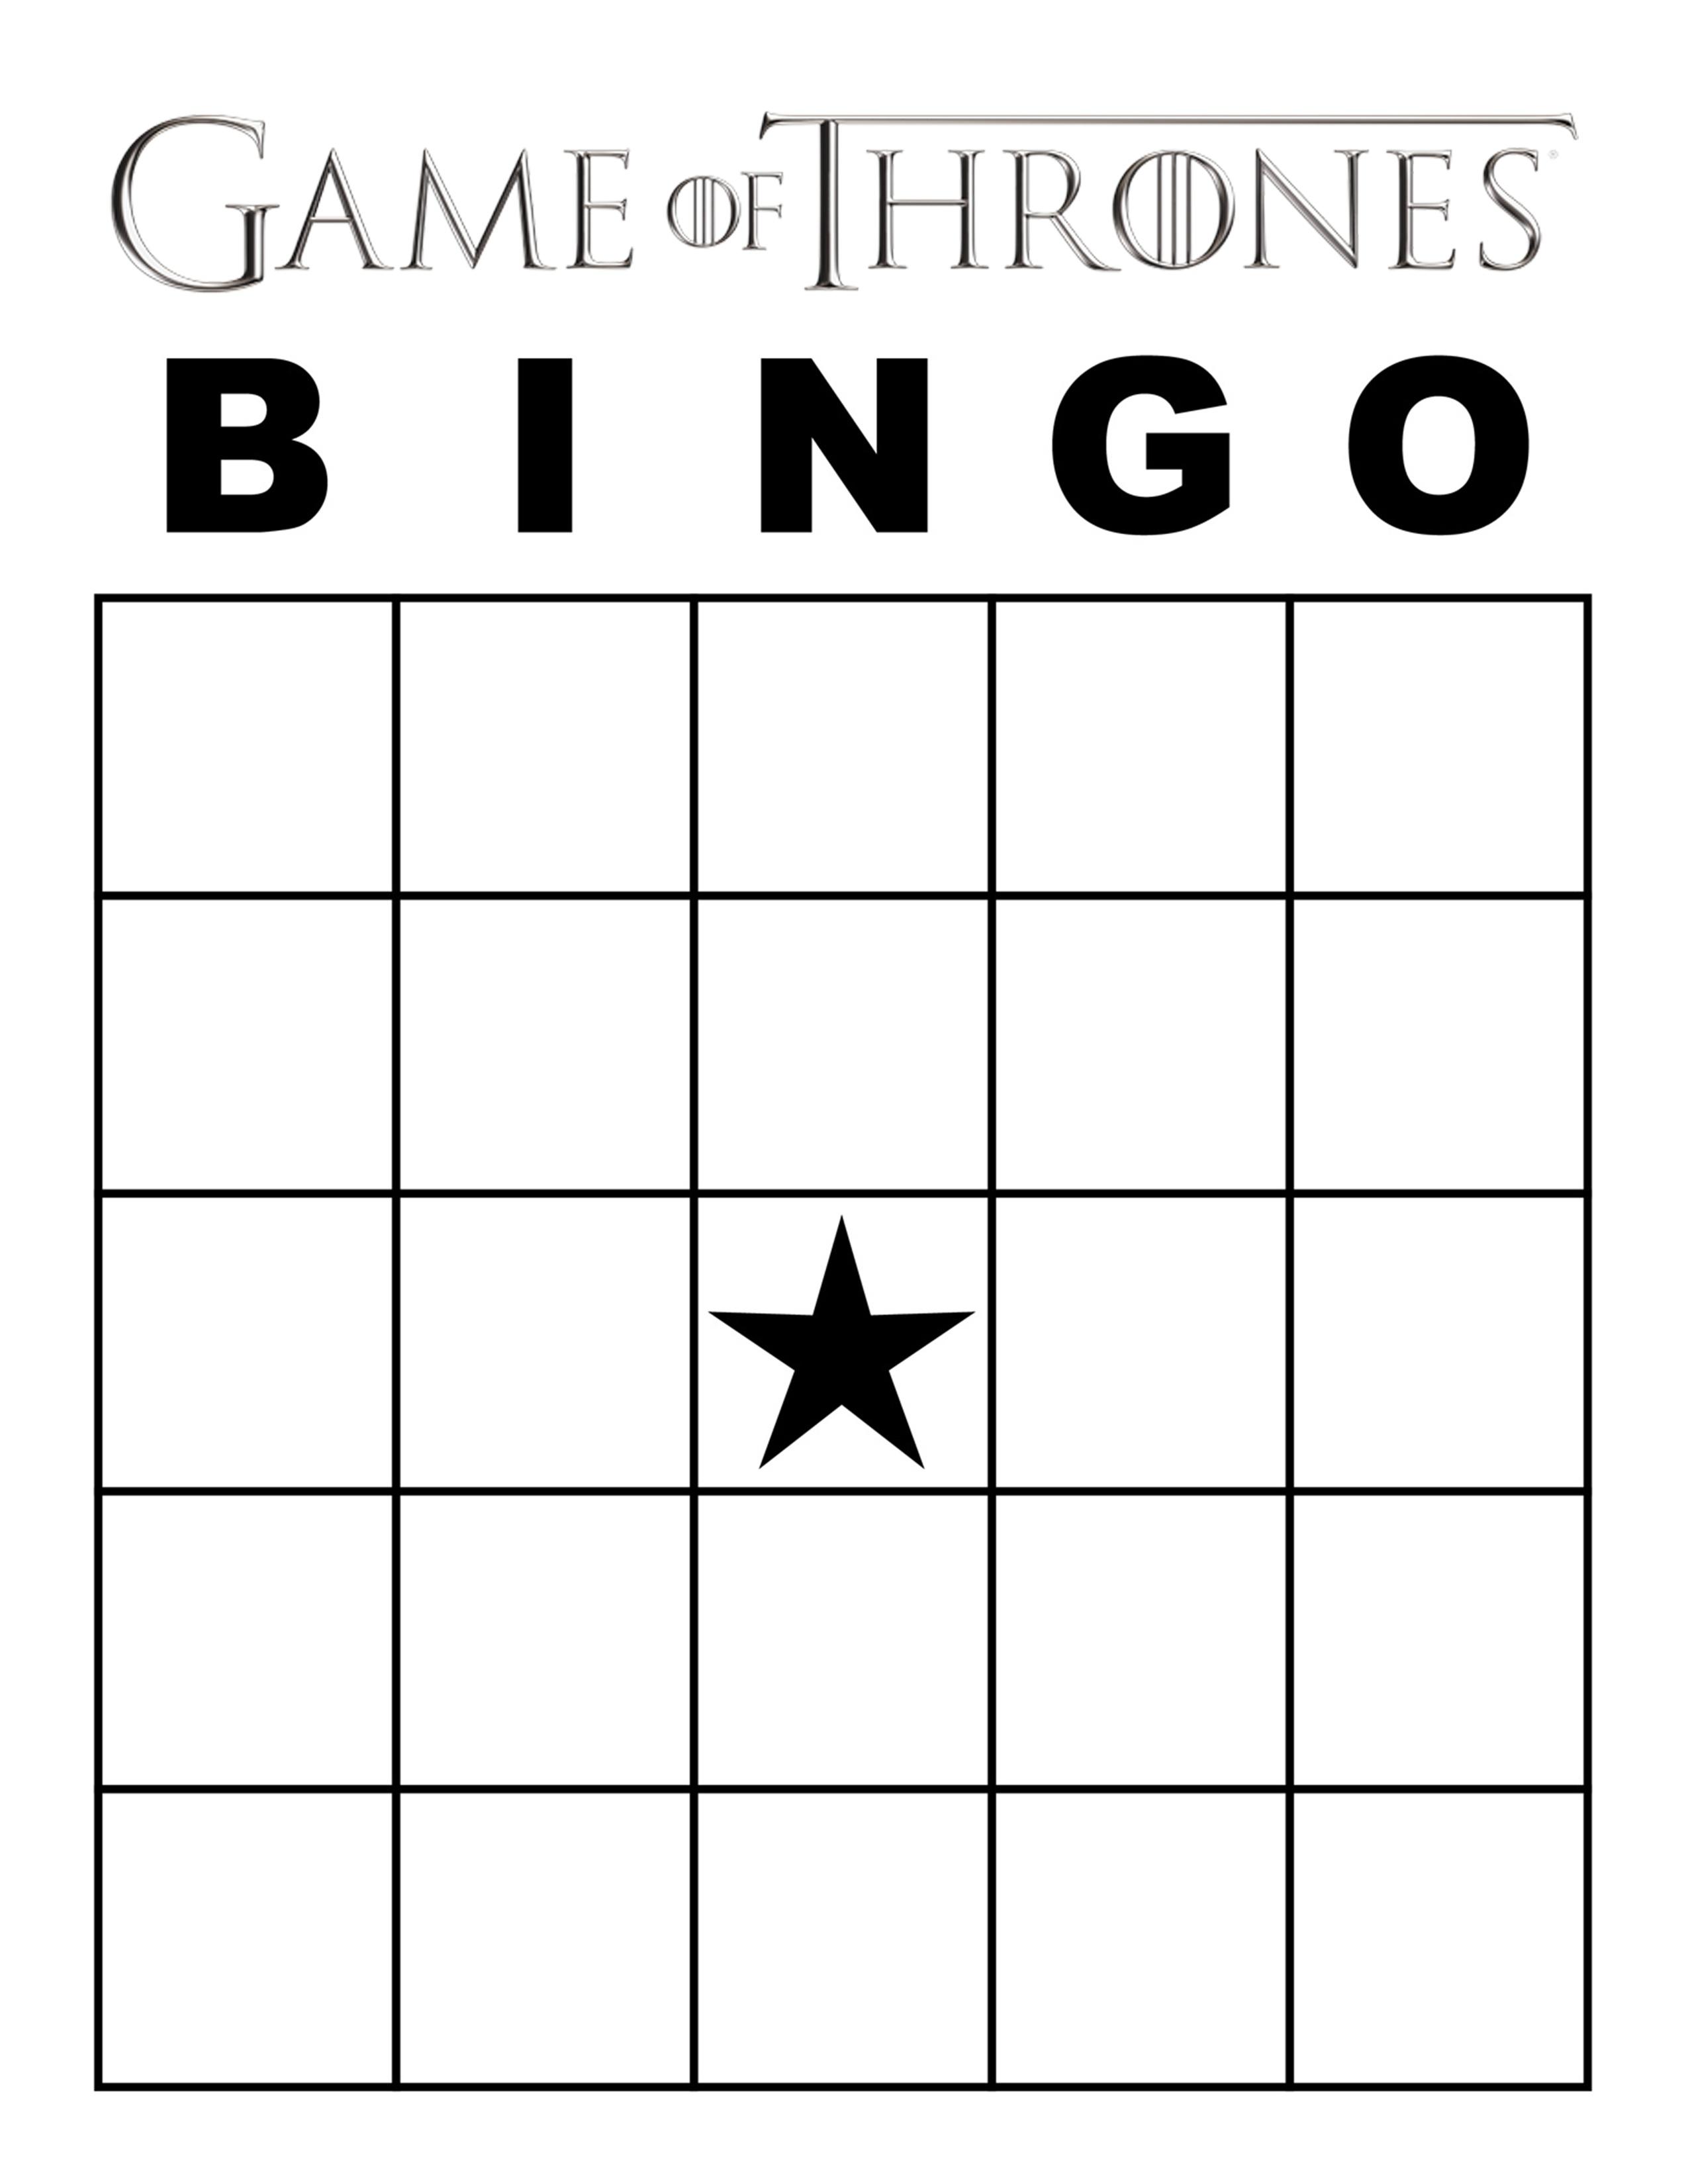 Game Of Thrones Season 7 Bingo – Printable Party Game - Free Printable Bingo Cards 1 100